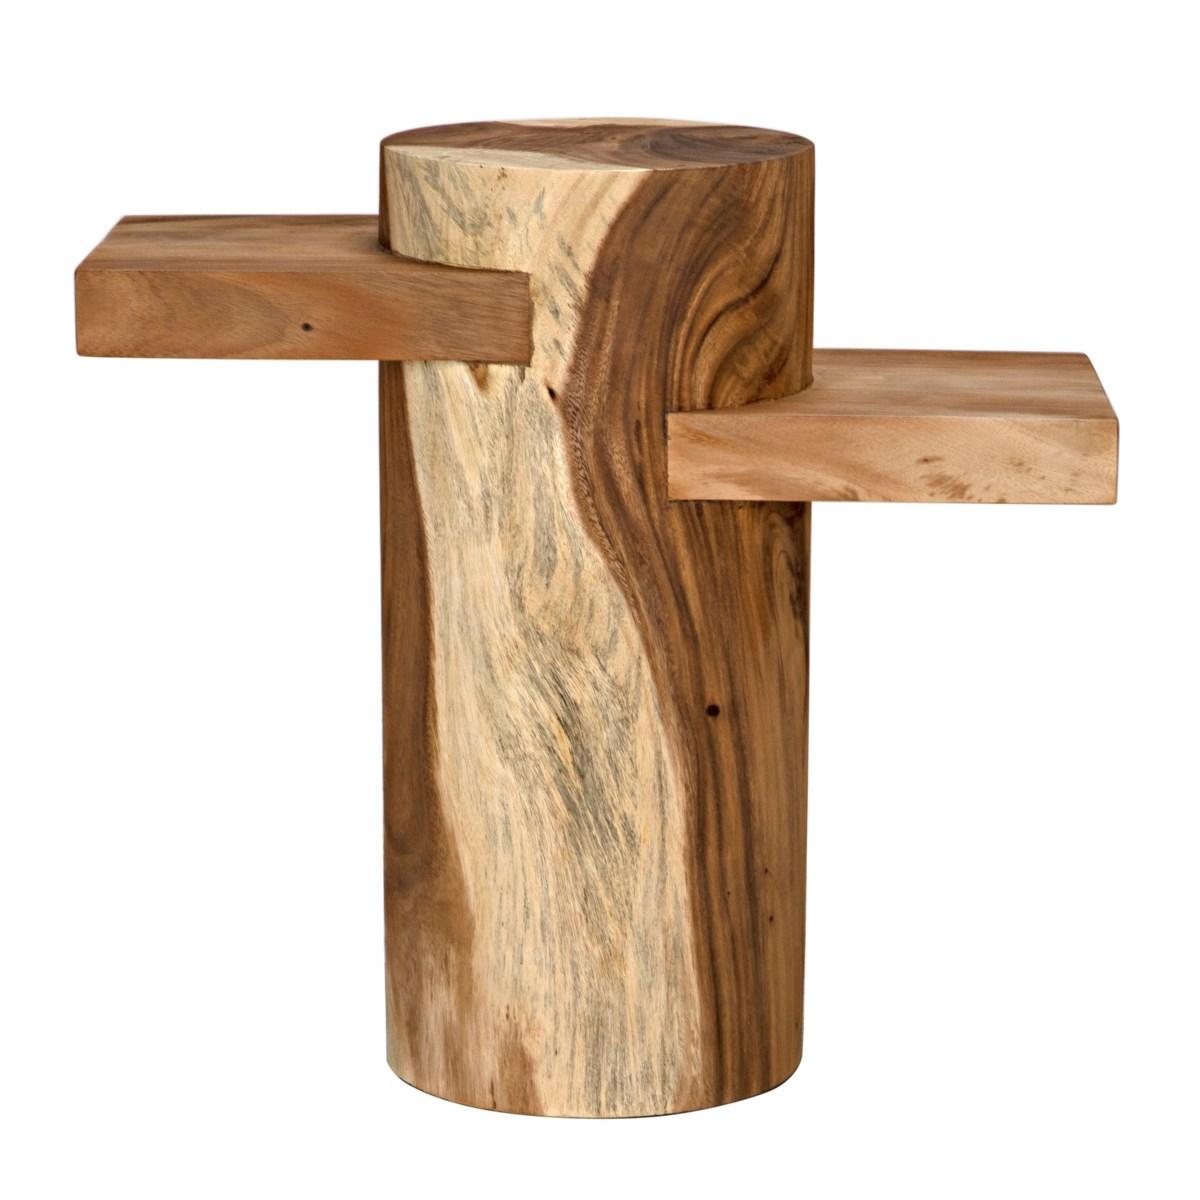 Tabula Side Table, Munggur Wood